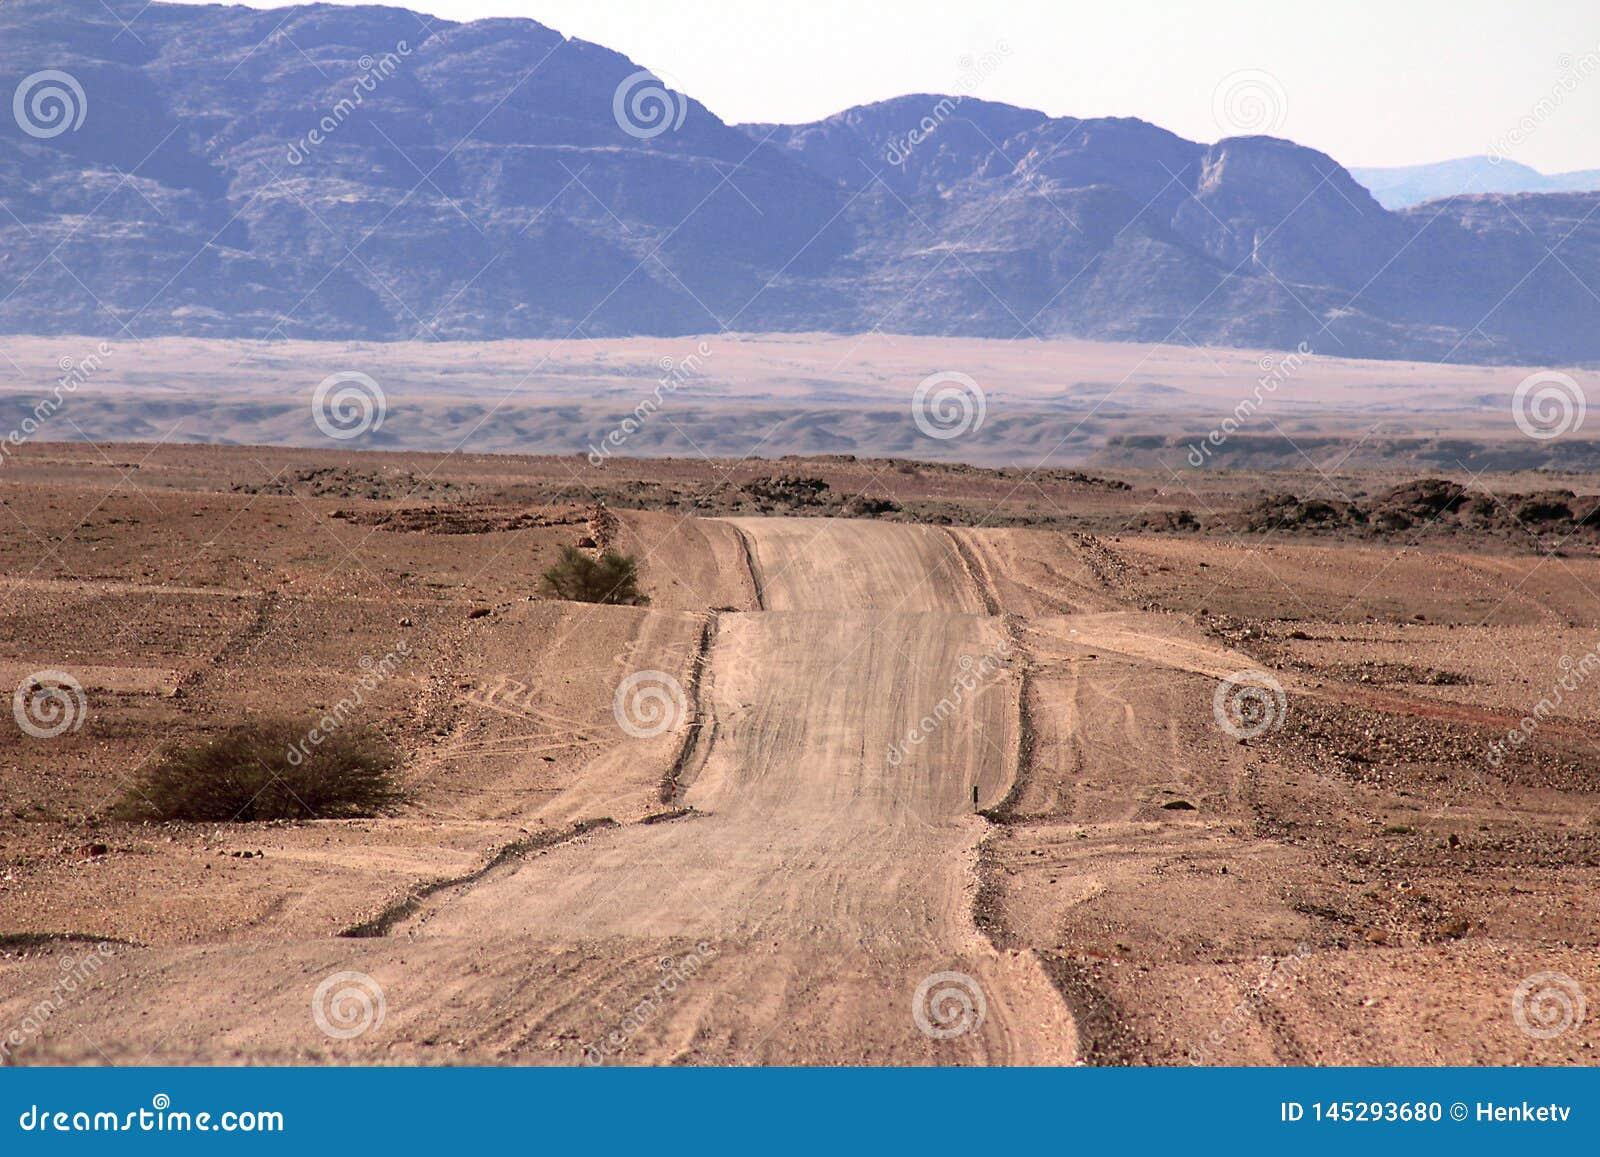 Ground road through the desert